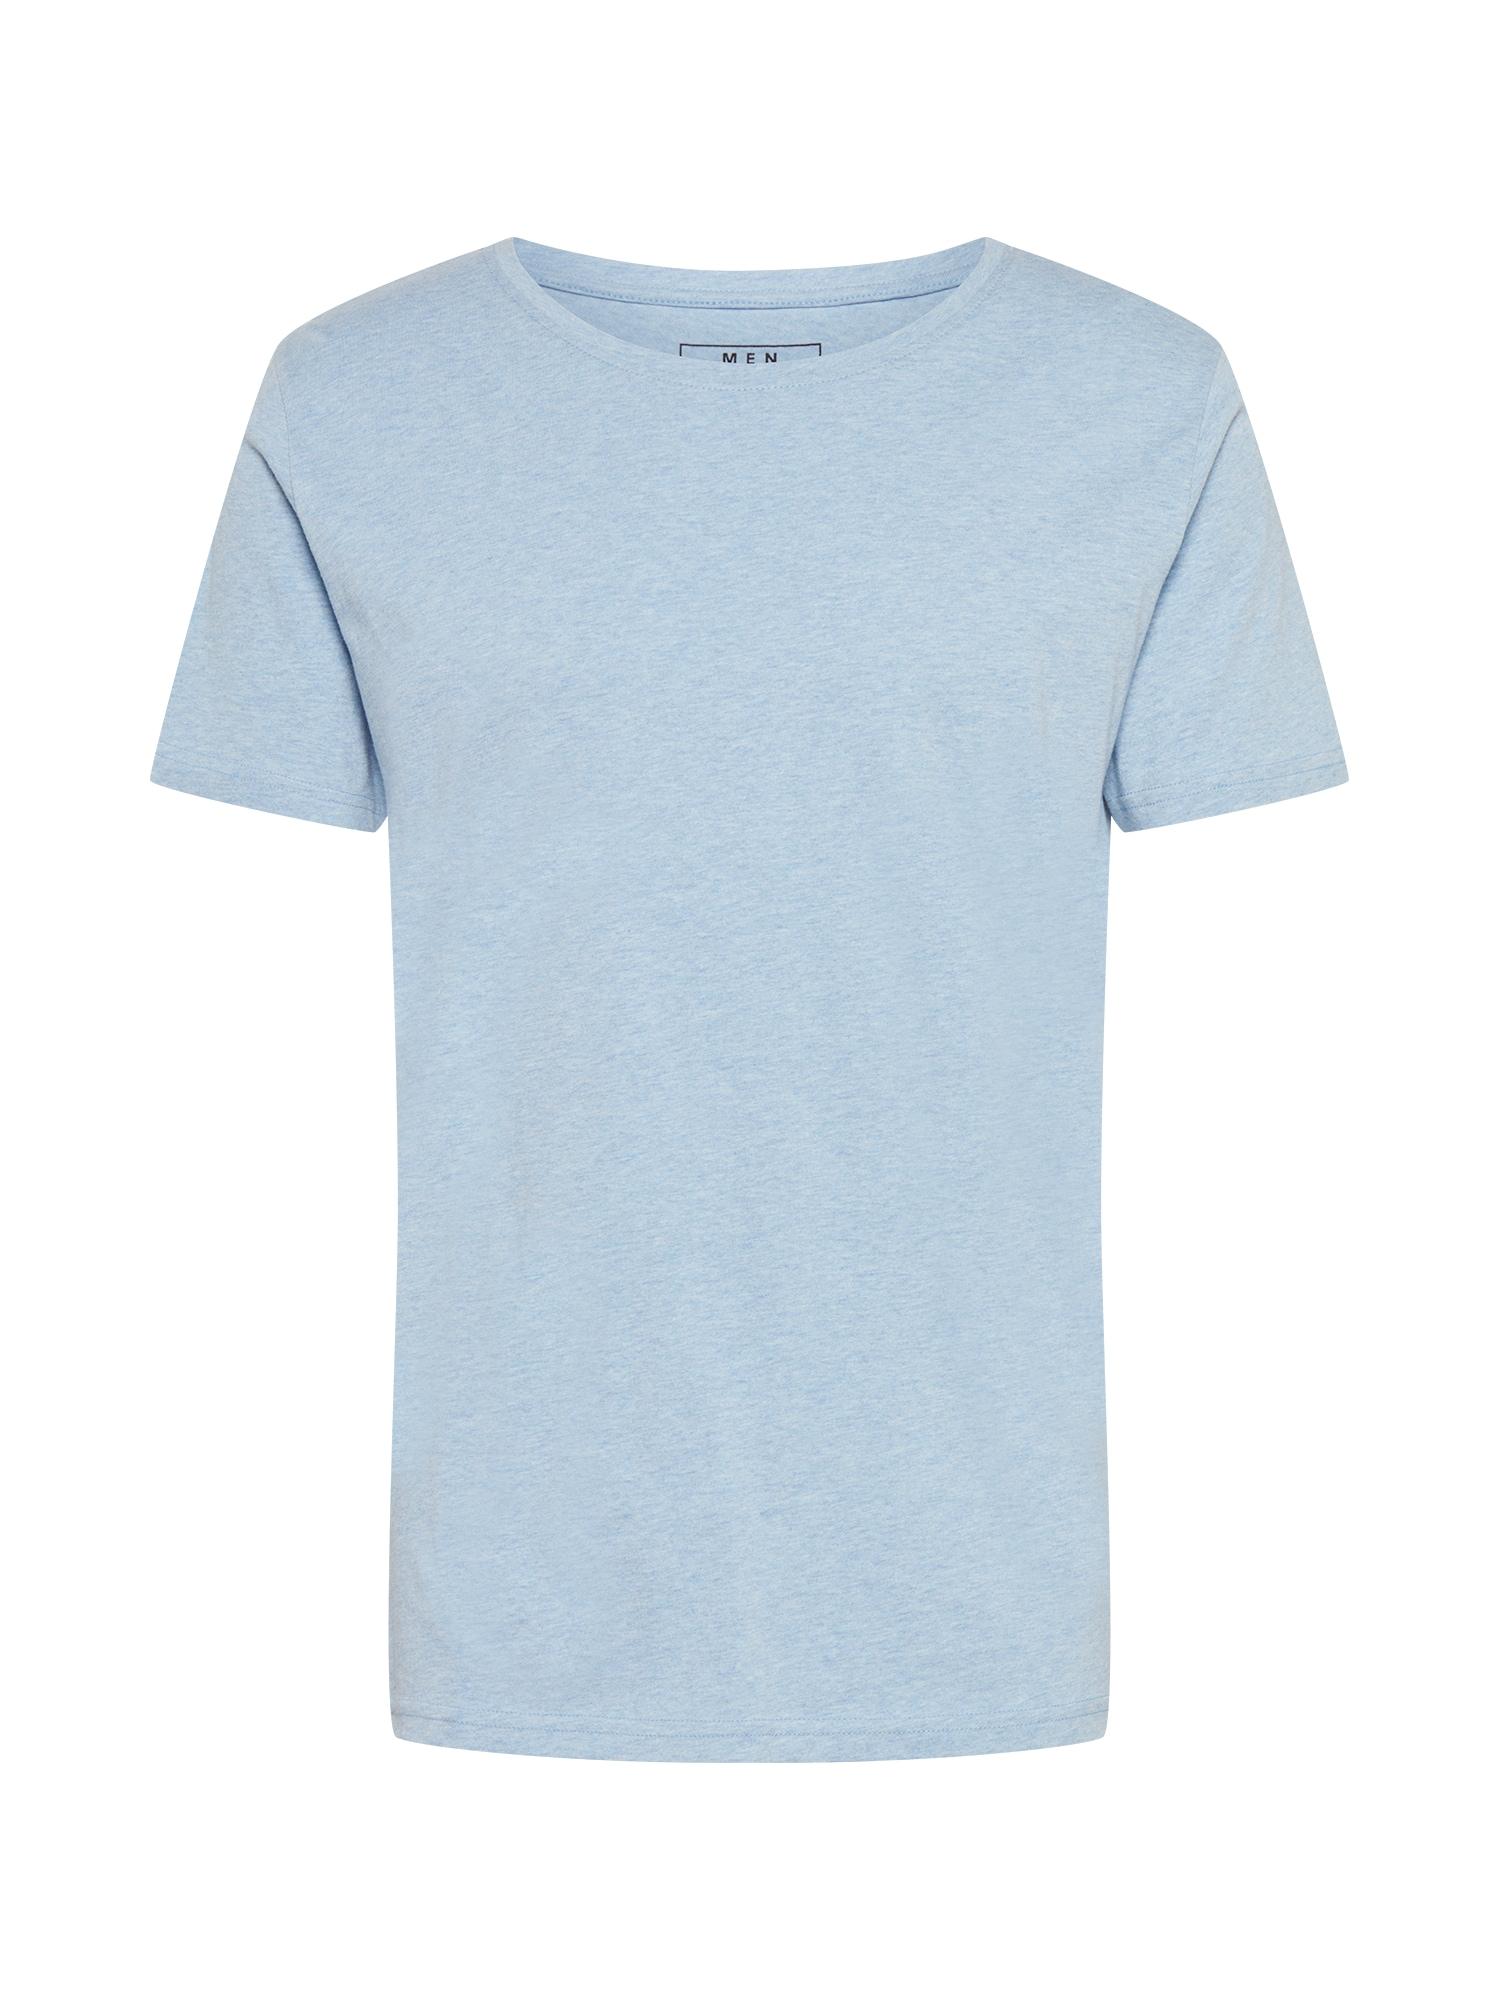 MELAWEAR Marškinėliai opalo